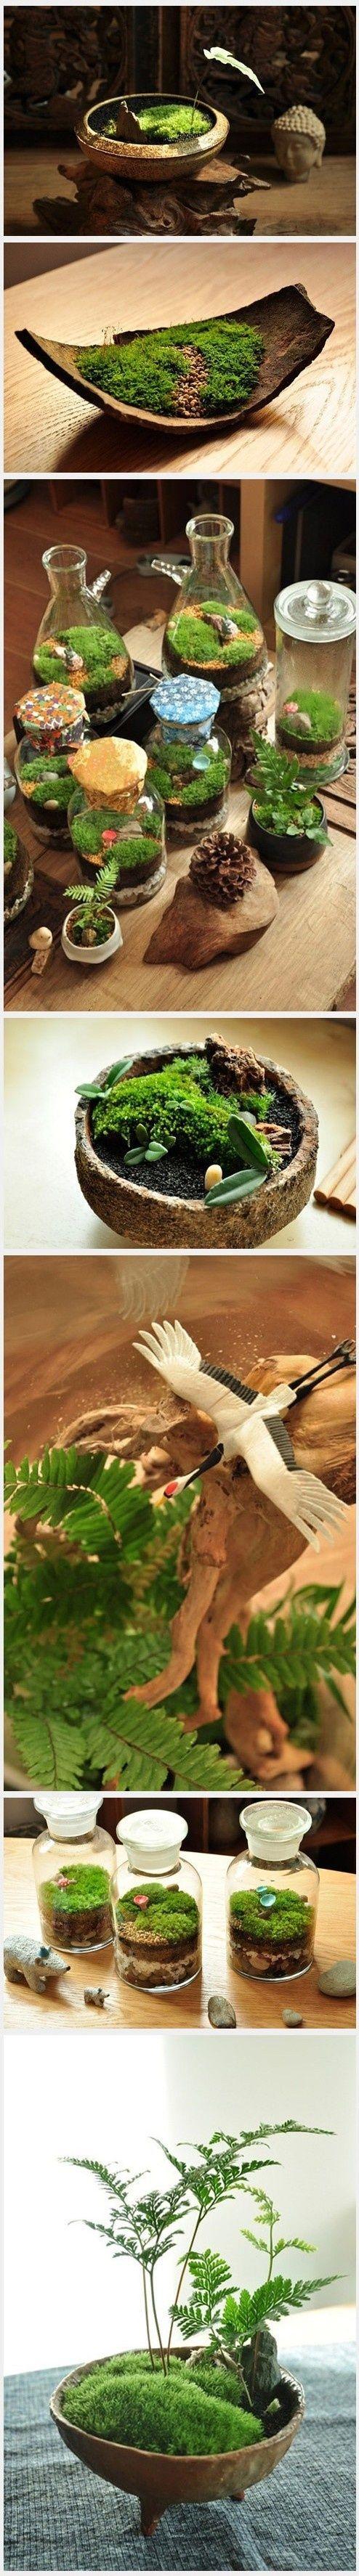 Moss gardens, for Kensie to make a fairy garden....so cute.: